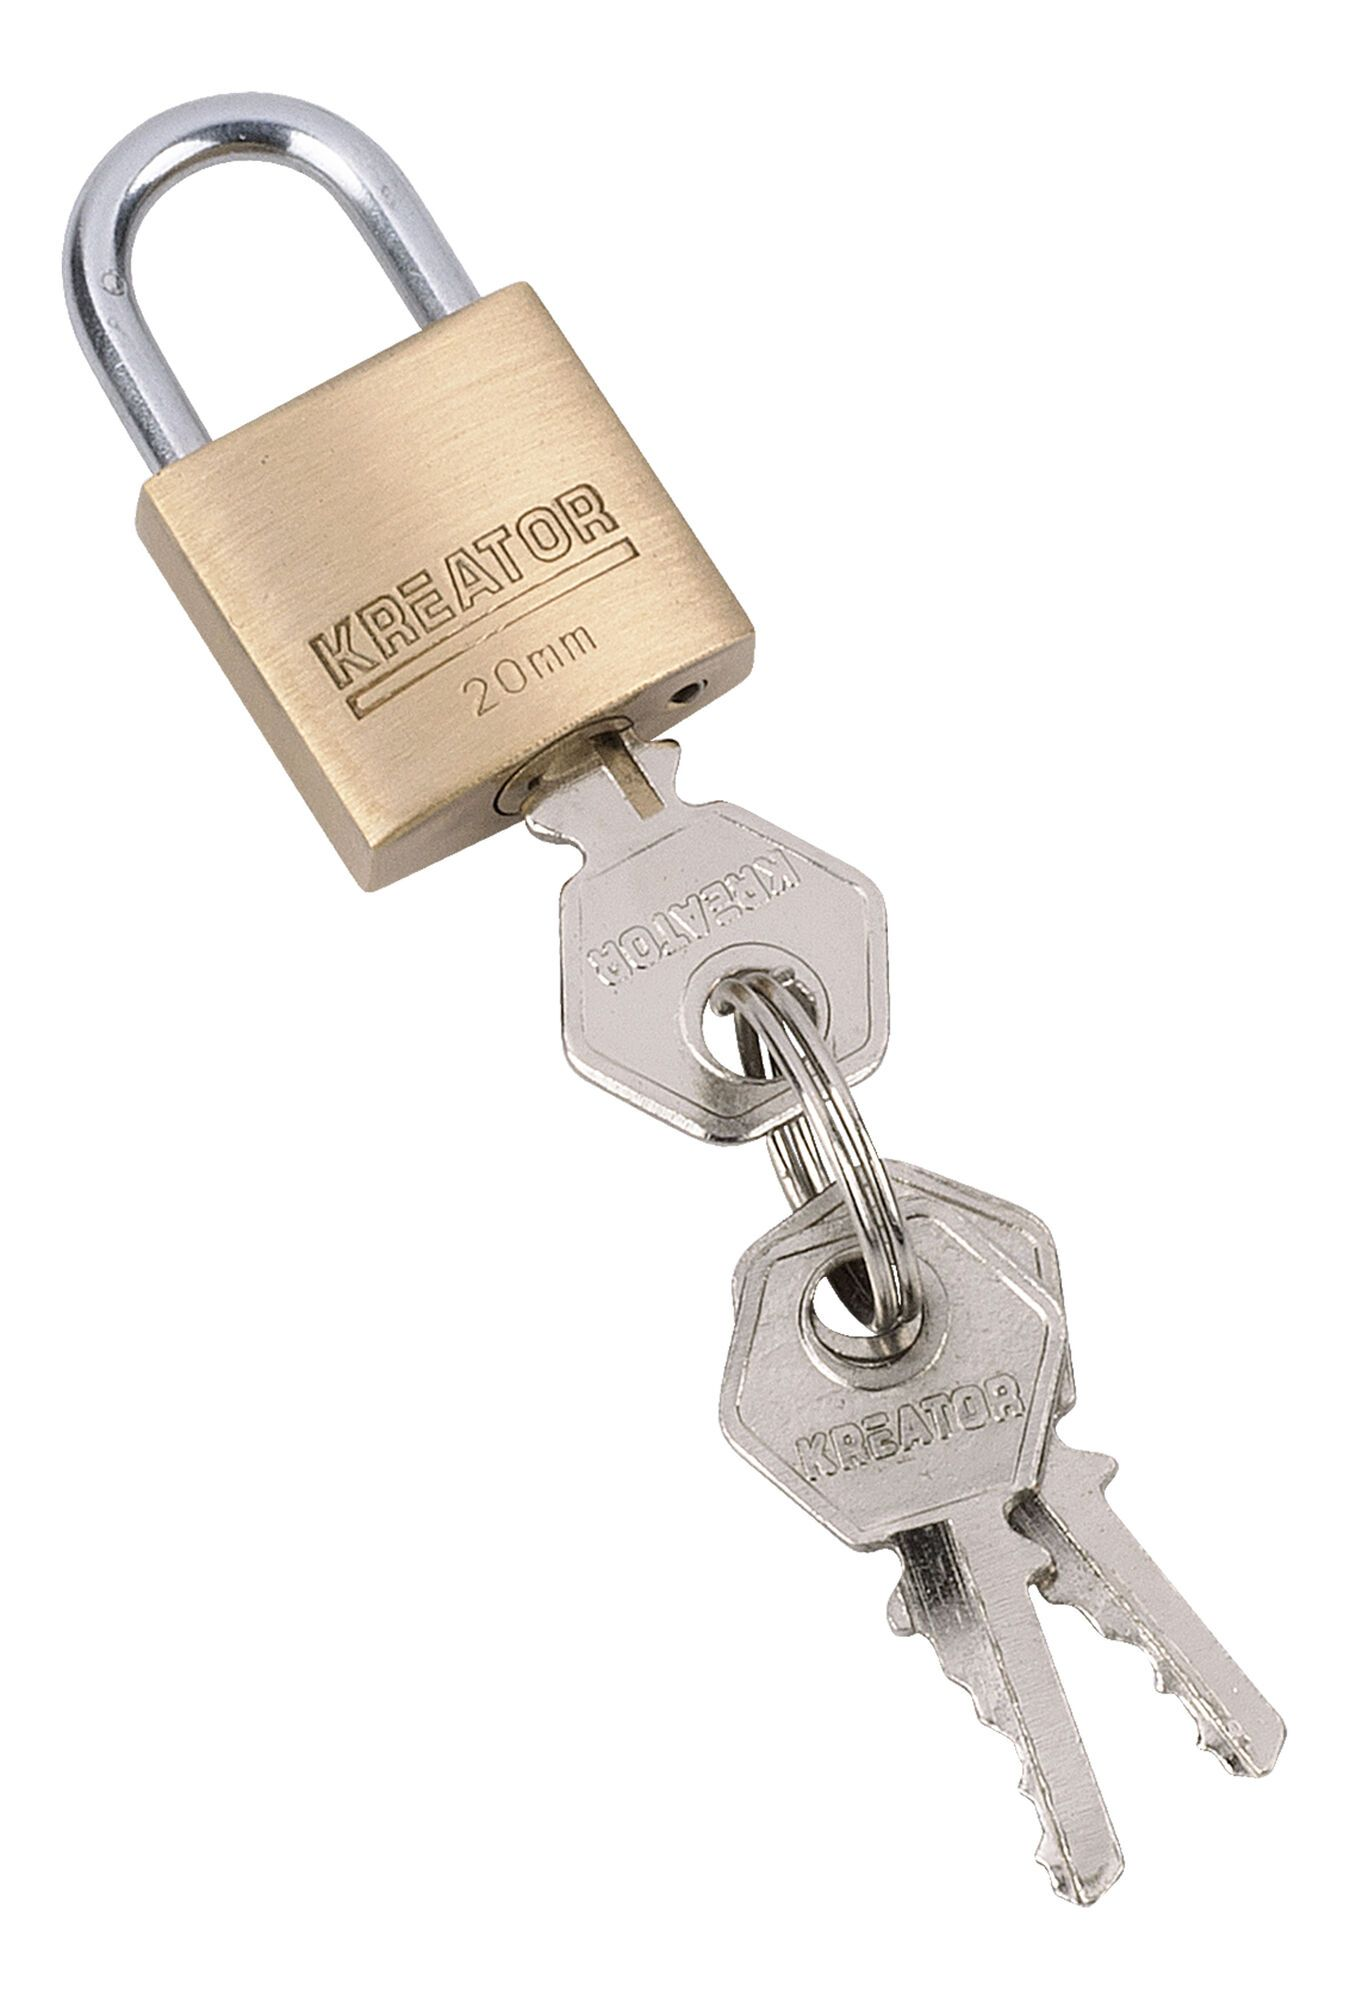 Kreator KRT557001 Hangslot | Messing Slot van 20 mm